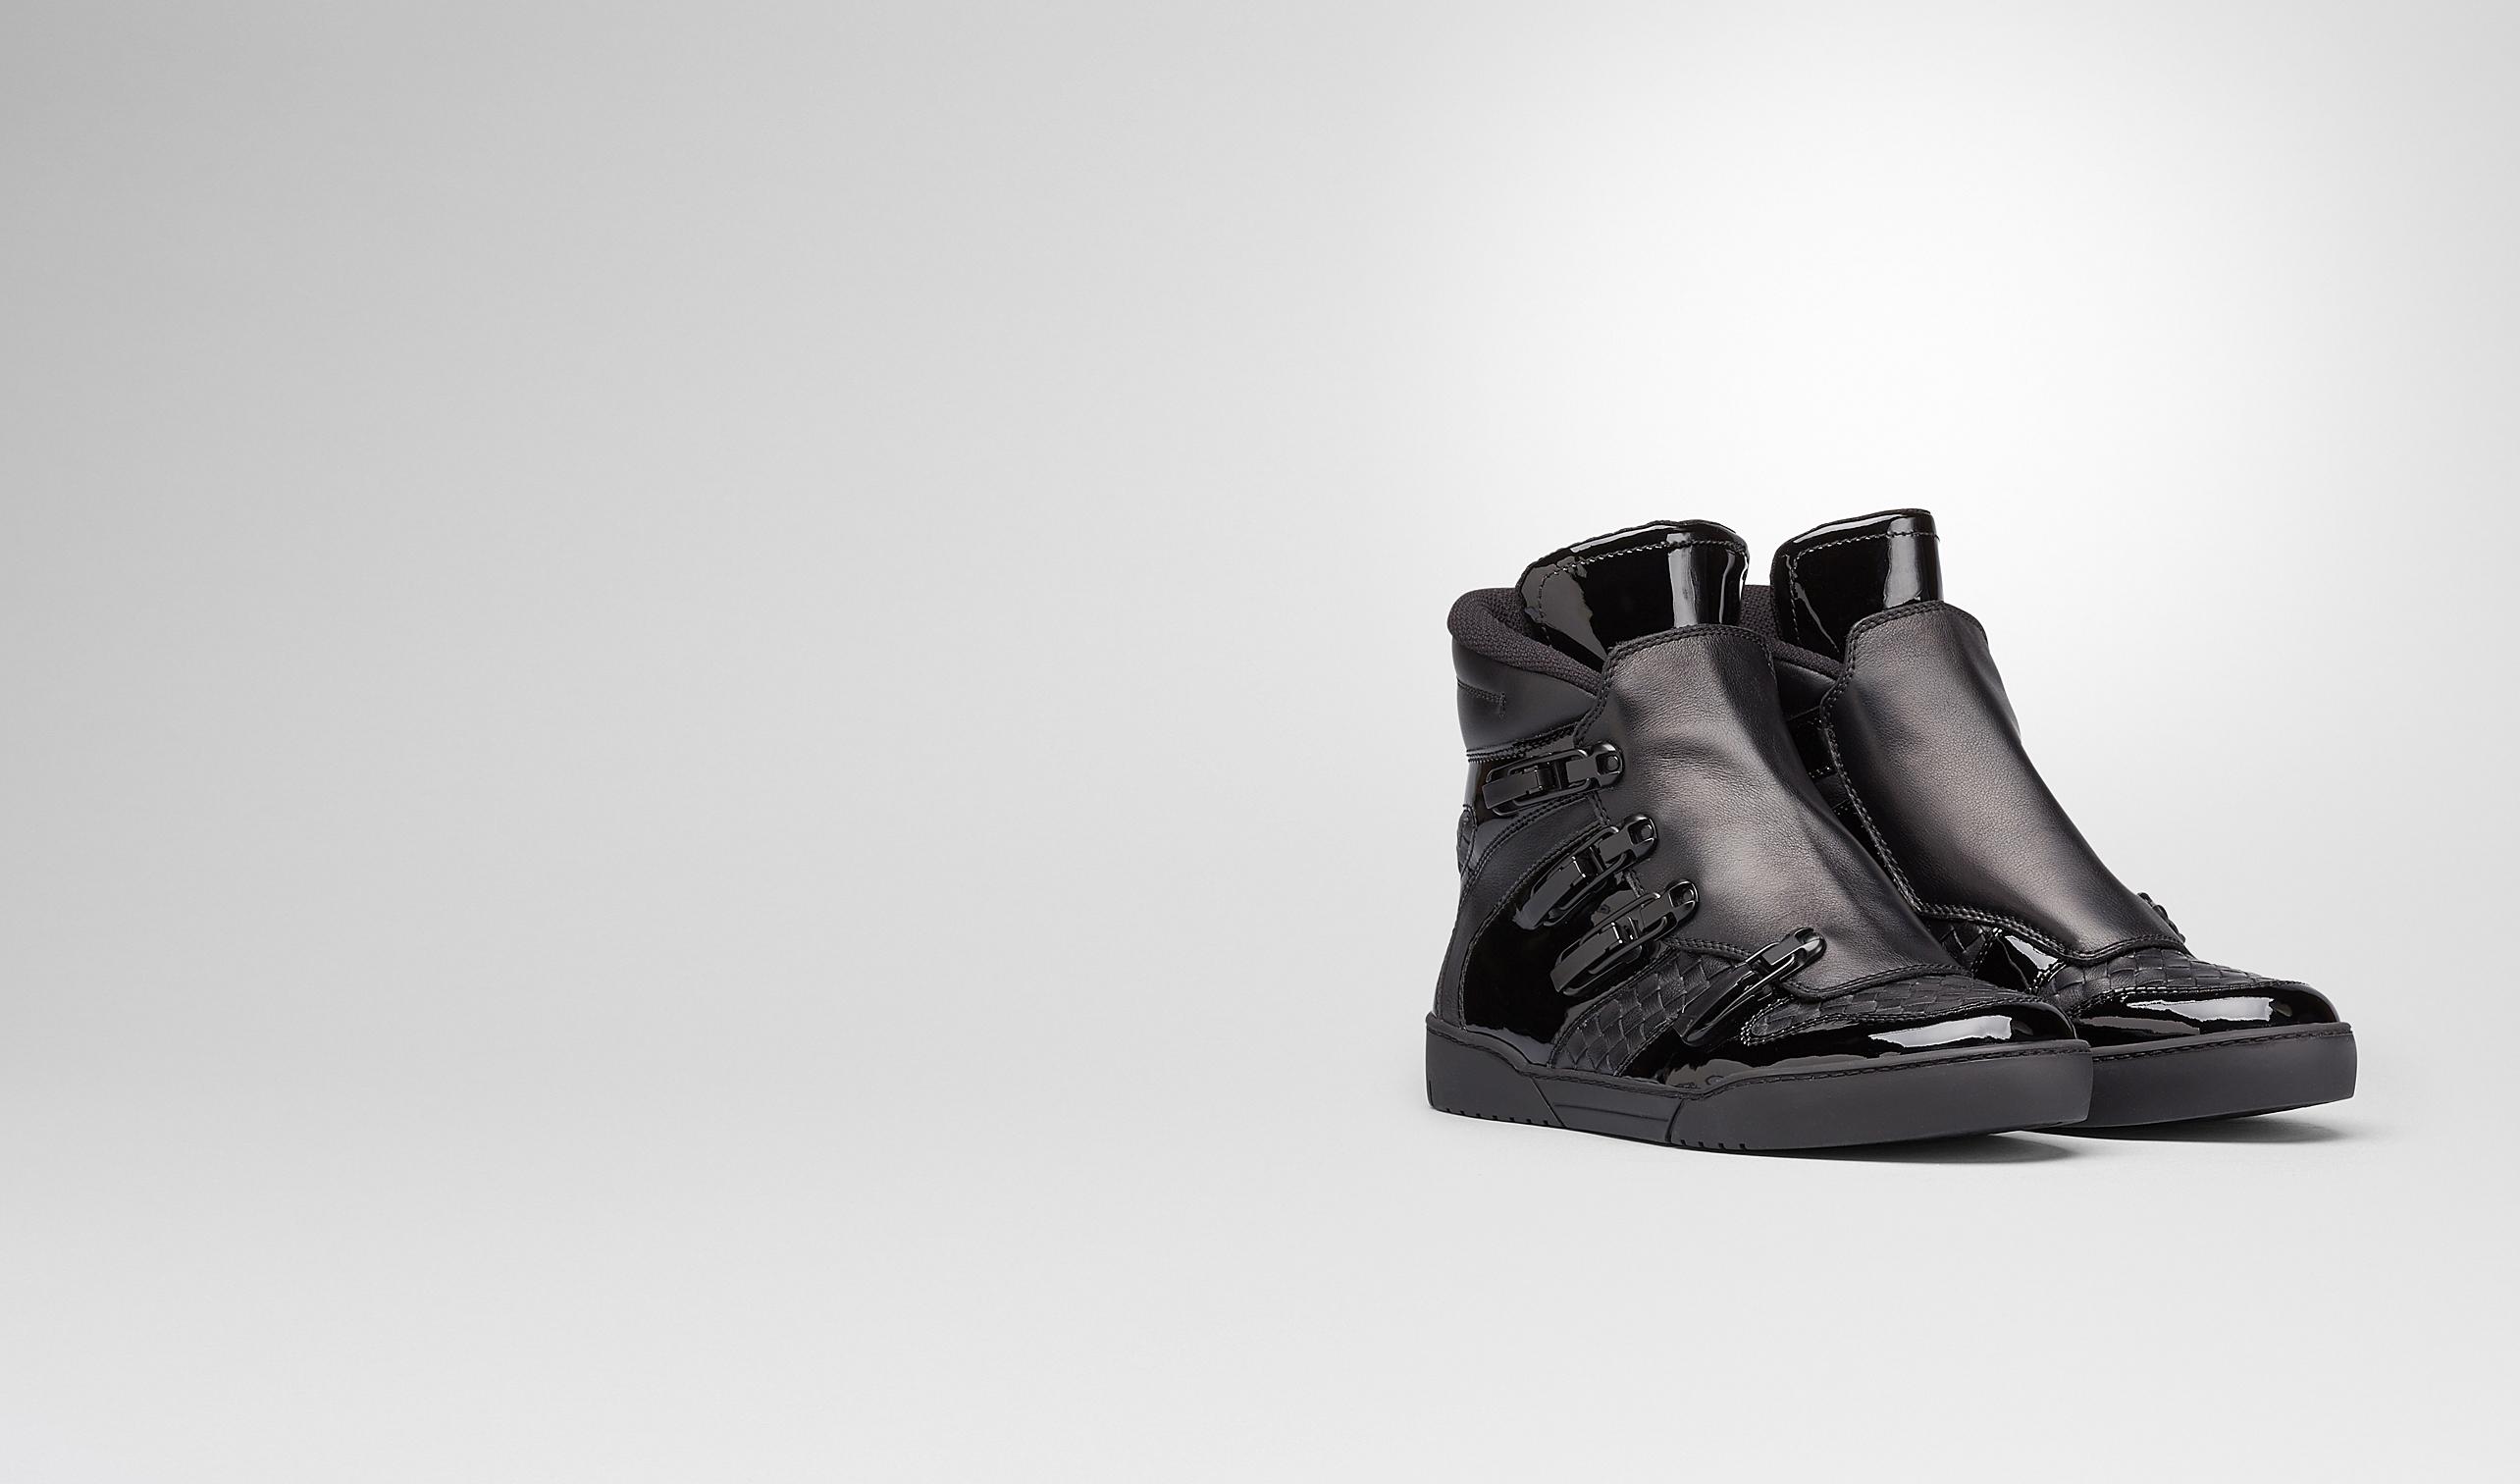 BOTTEGA VENETA Sneaker oder Sandale U SNEAKER AUS KALBSLEDER INTRECCIATO UND LACK NERO pl